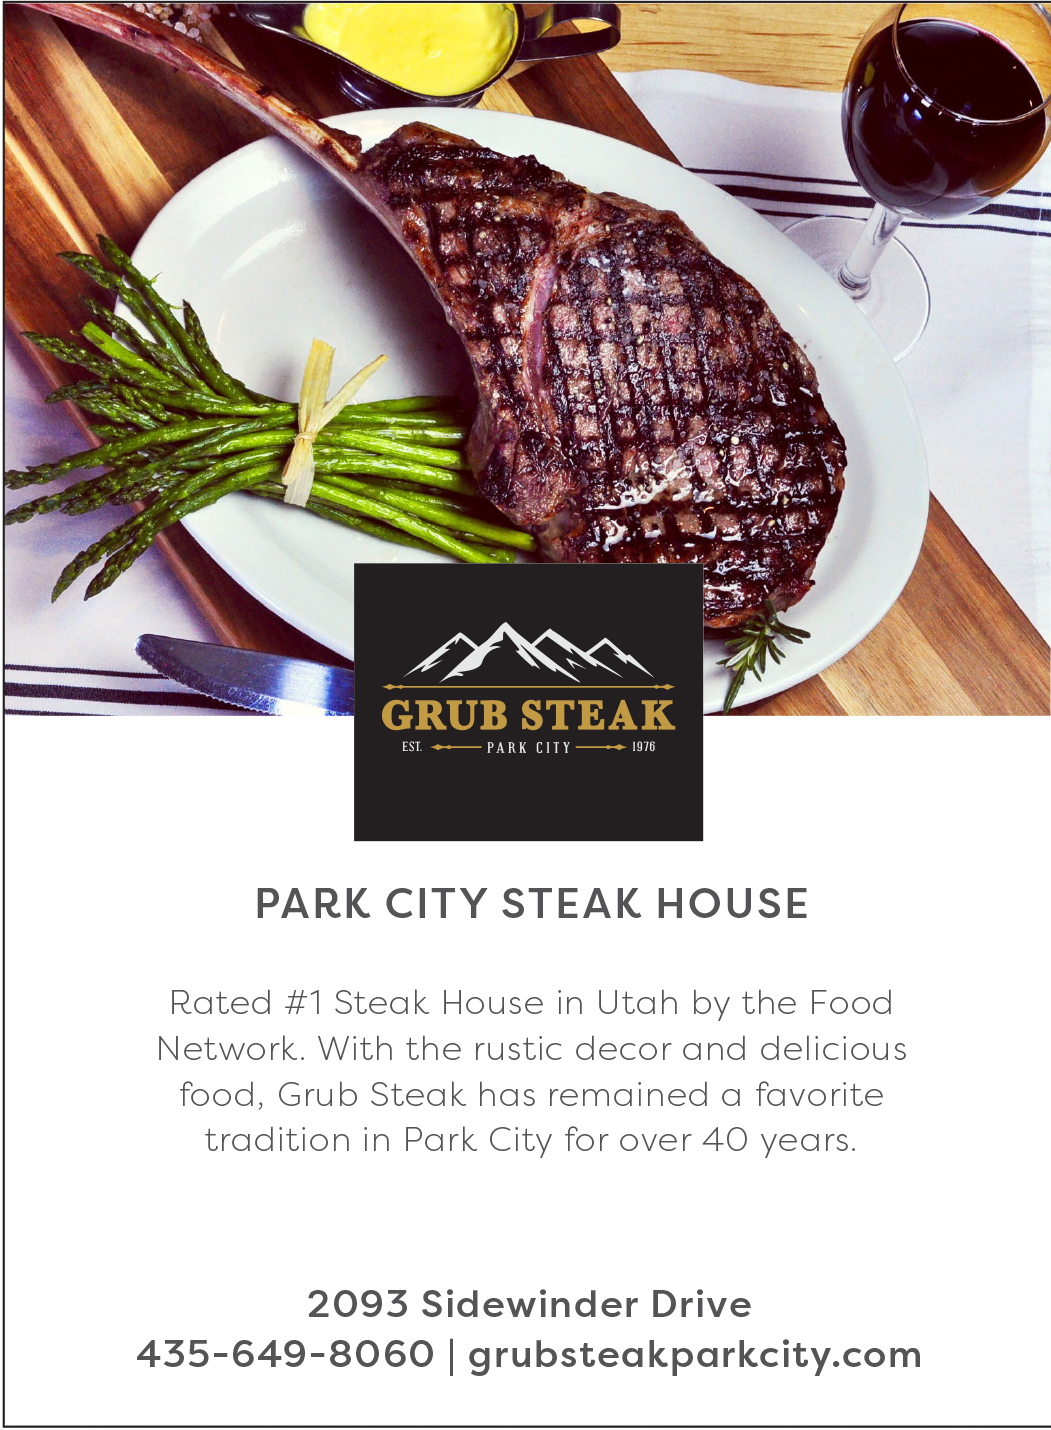 Grub Steak Park City